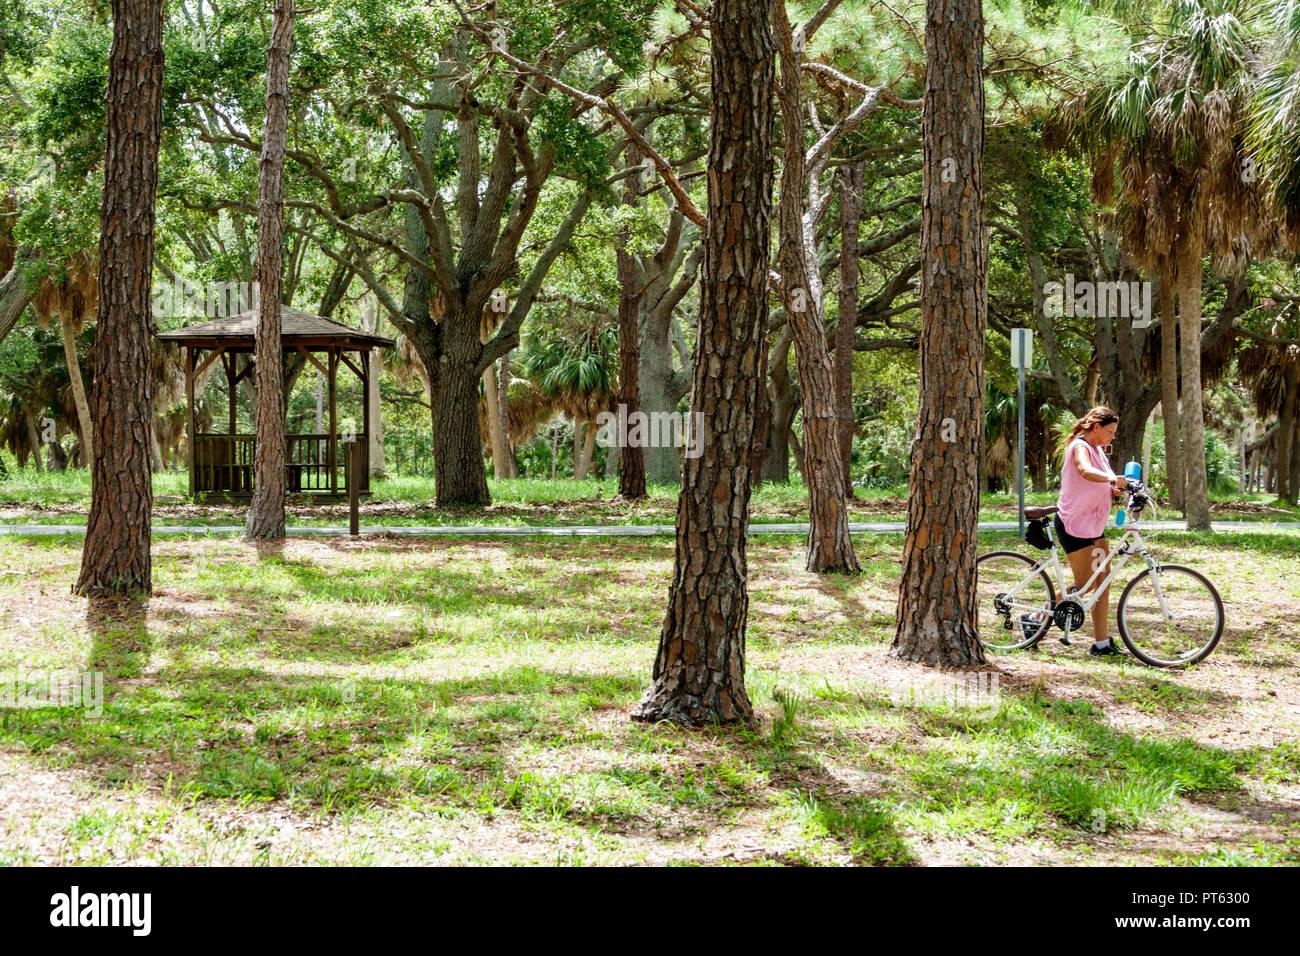 St. Saint Petersburg Florida Bay Pines War Veterans Memorial Park woman bicycle trees - Stock Image